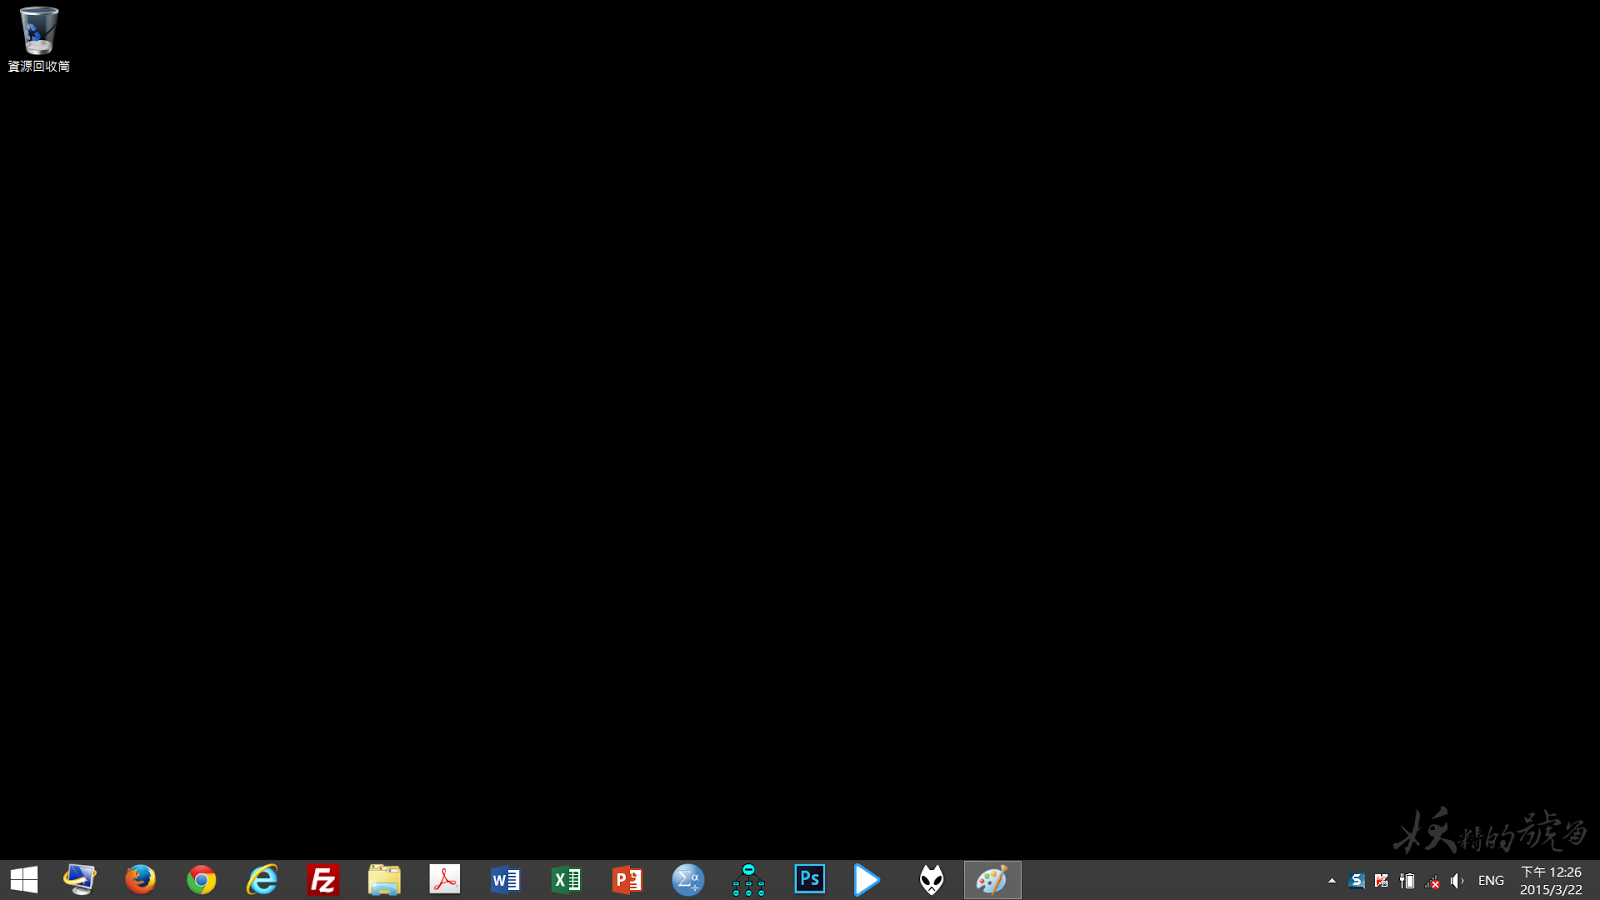 2015 03 22 12 26 41 - [開箱] Acer E5-572G i5-4210M 搭配NVIDIA 840G 2G獨顯